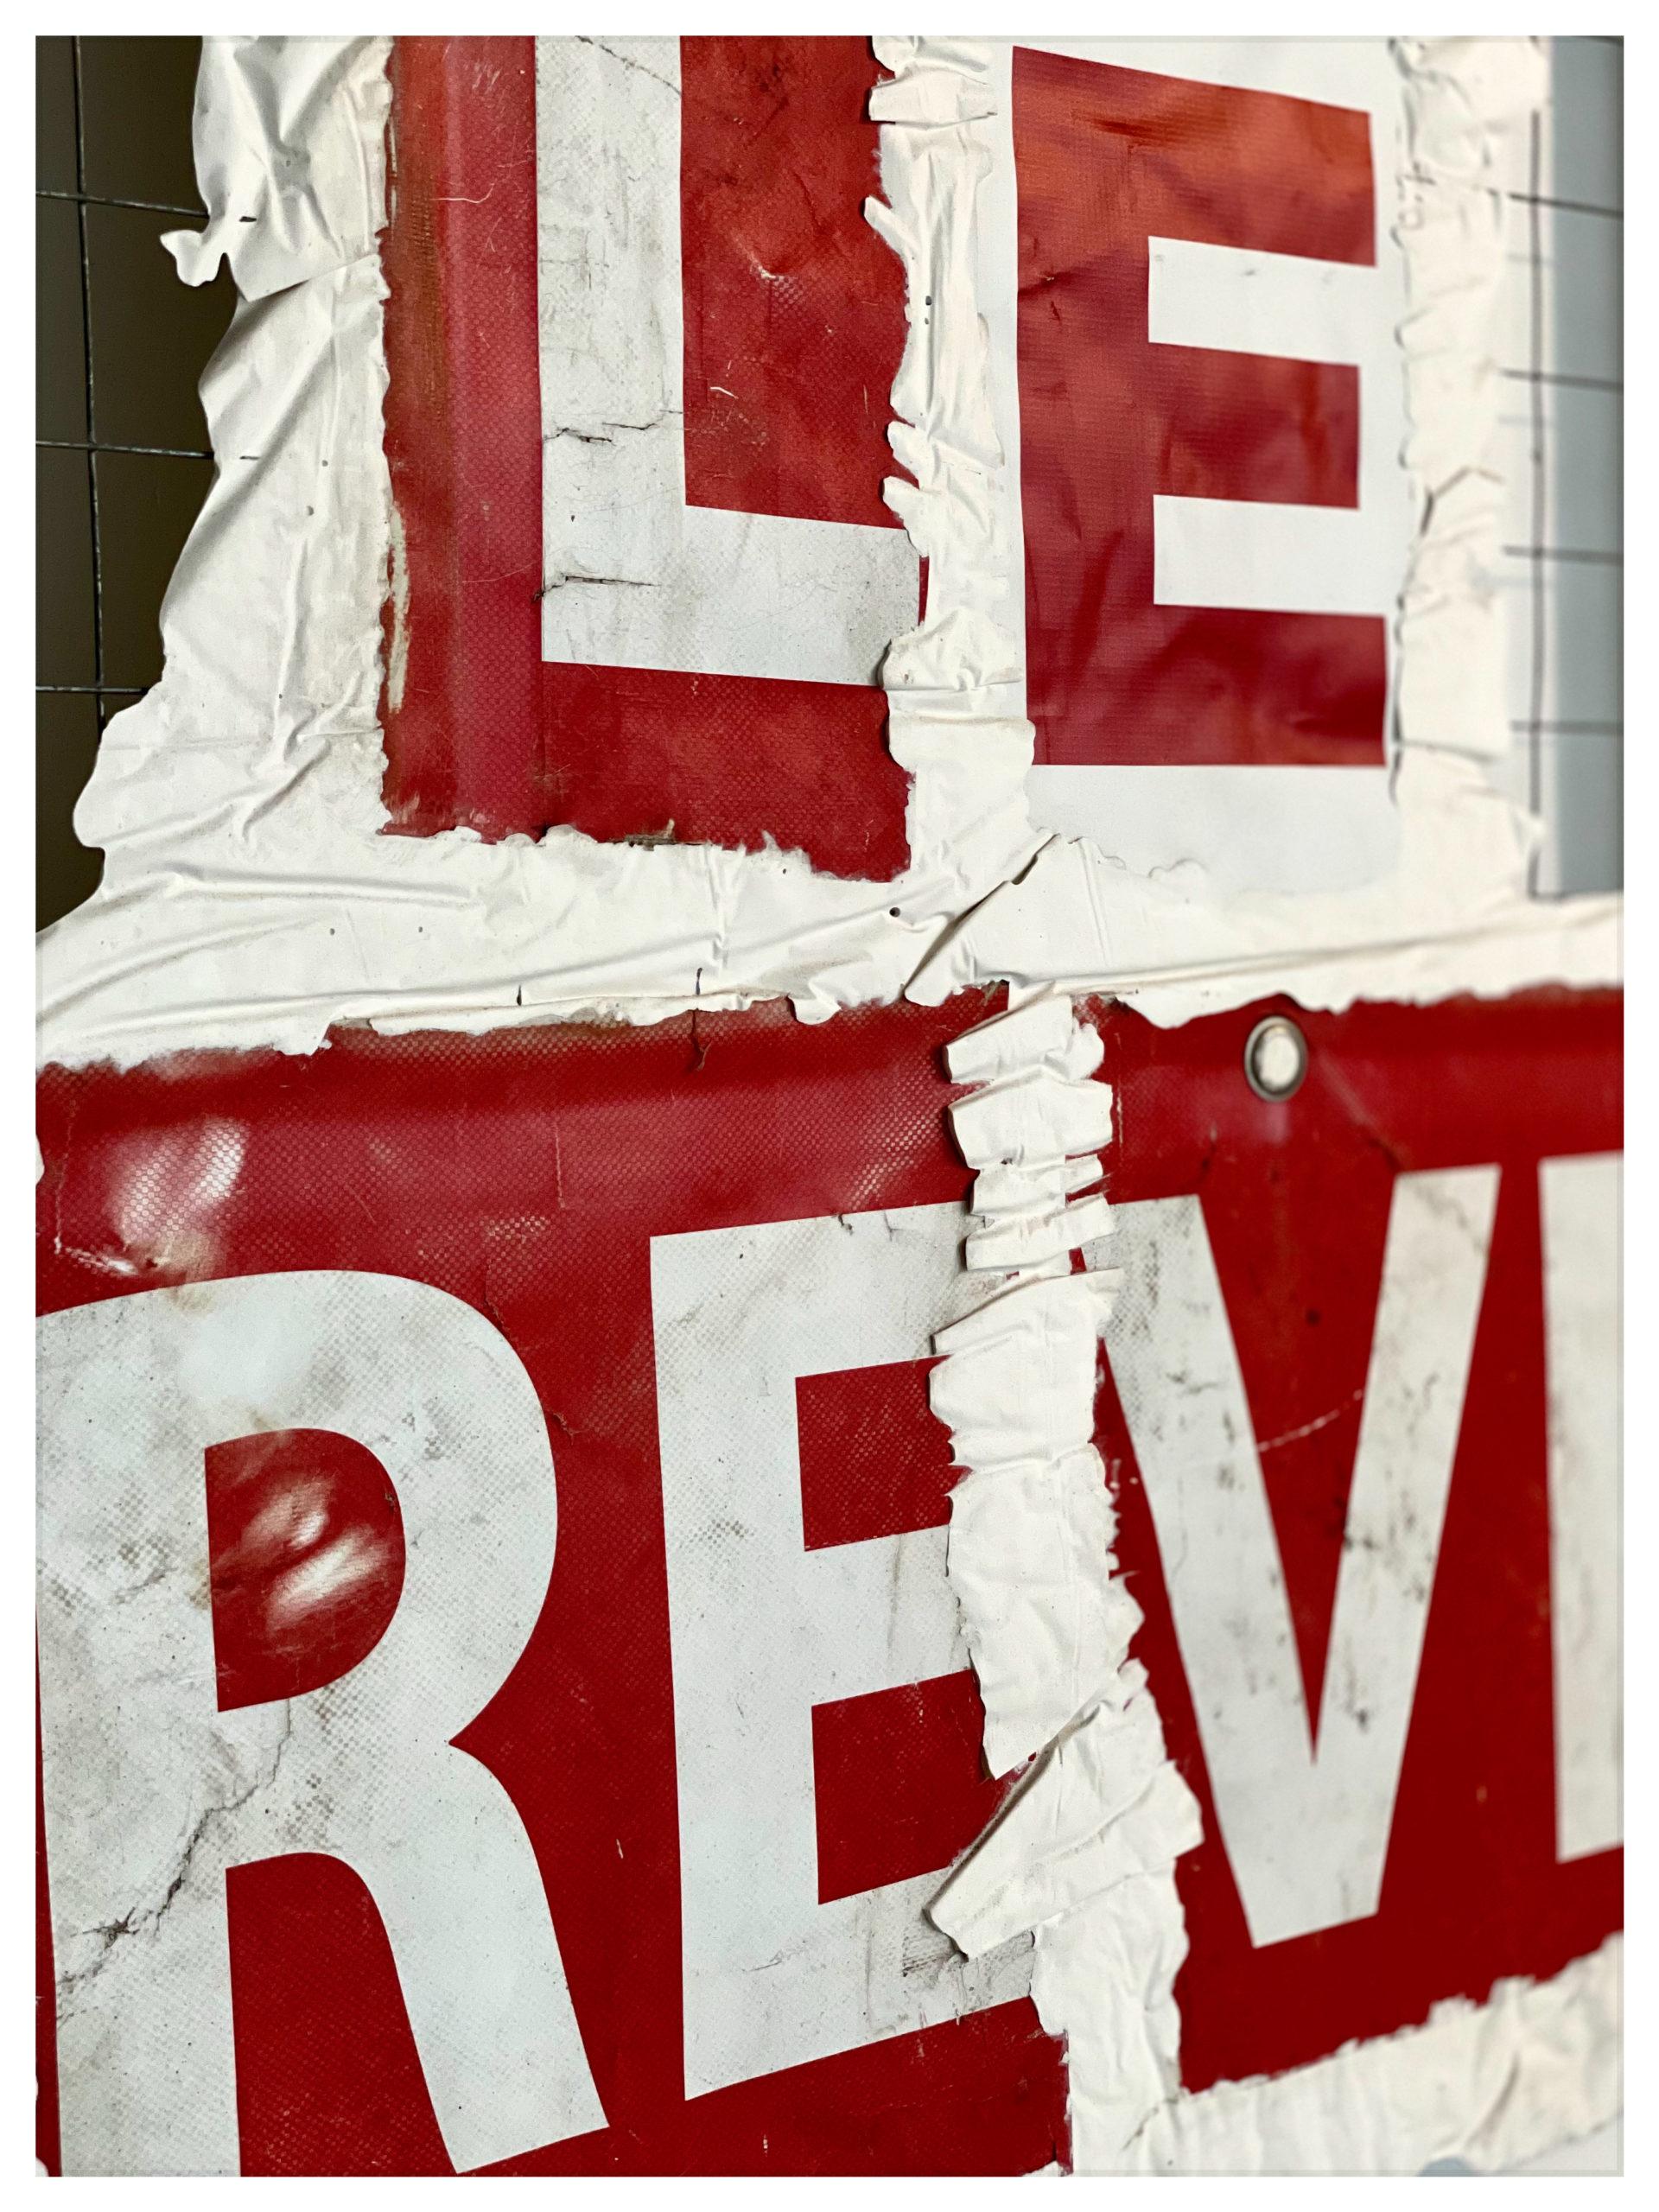 Wolf Cuyvers, Le Regard du Temps, courtesy artvisions